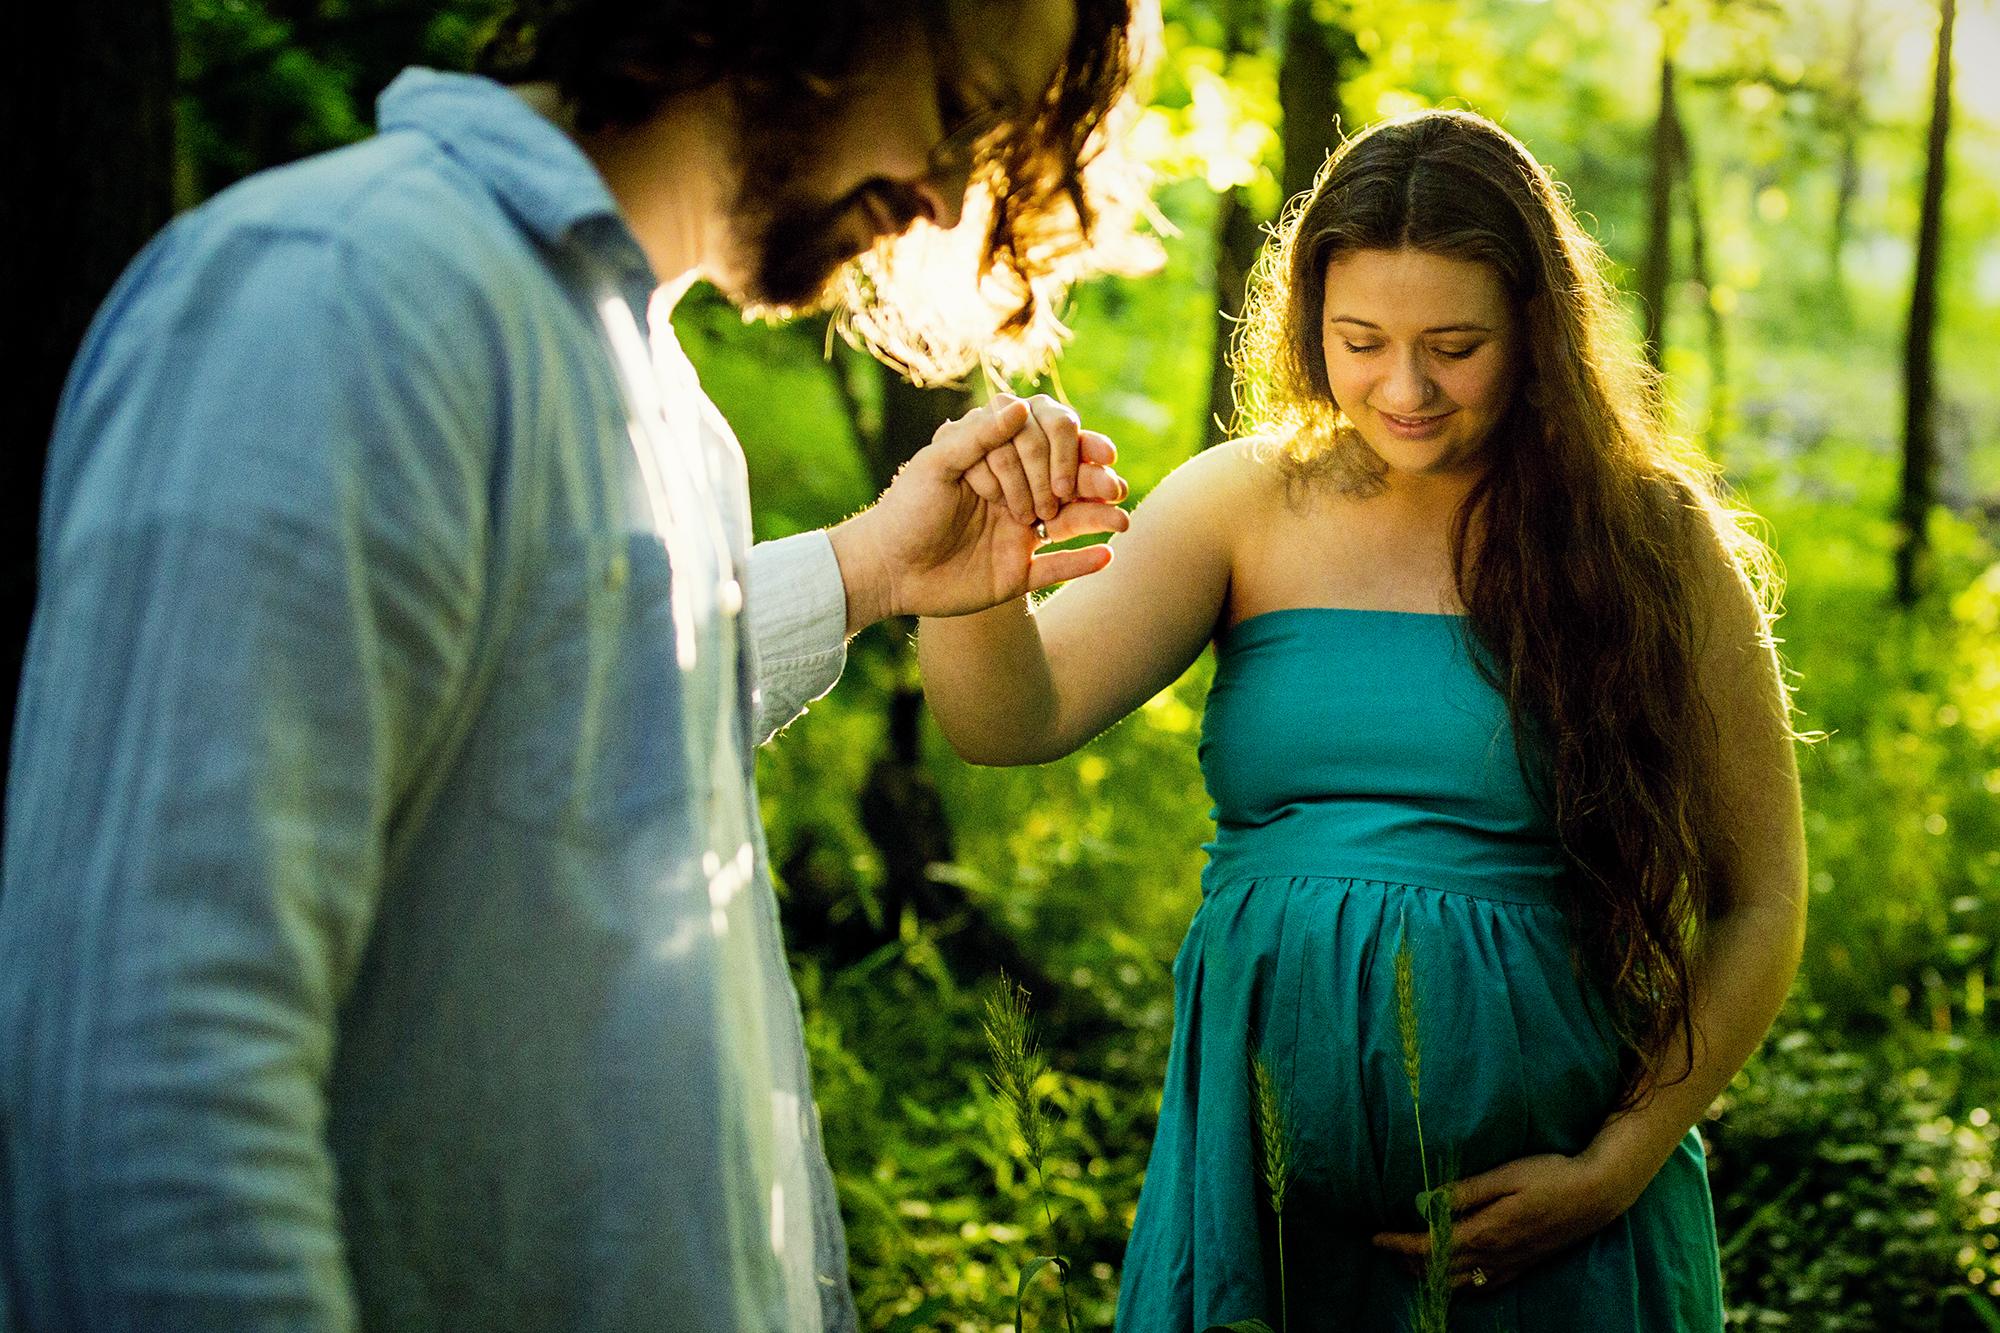 Seriously_Sabrina_Photography_Lexington_Kentucky_Maternity_Portraits_McConnell_Springs_Pagano13.jpg